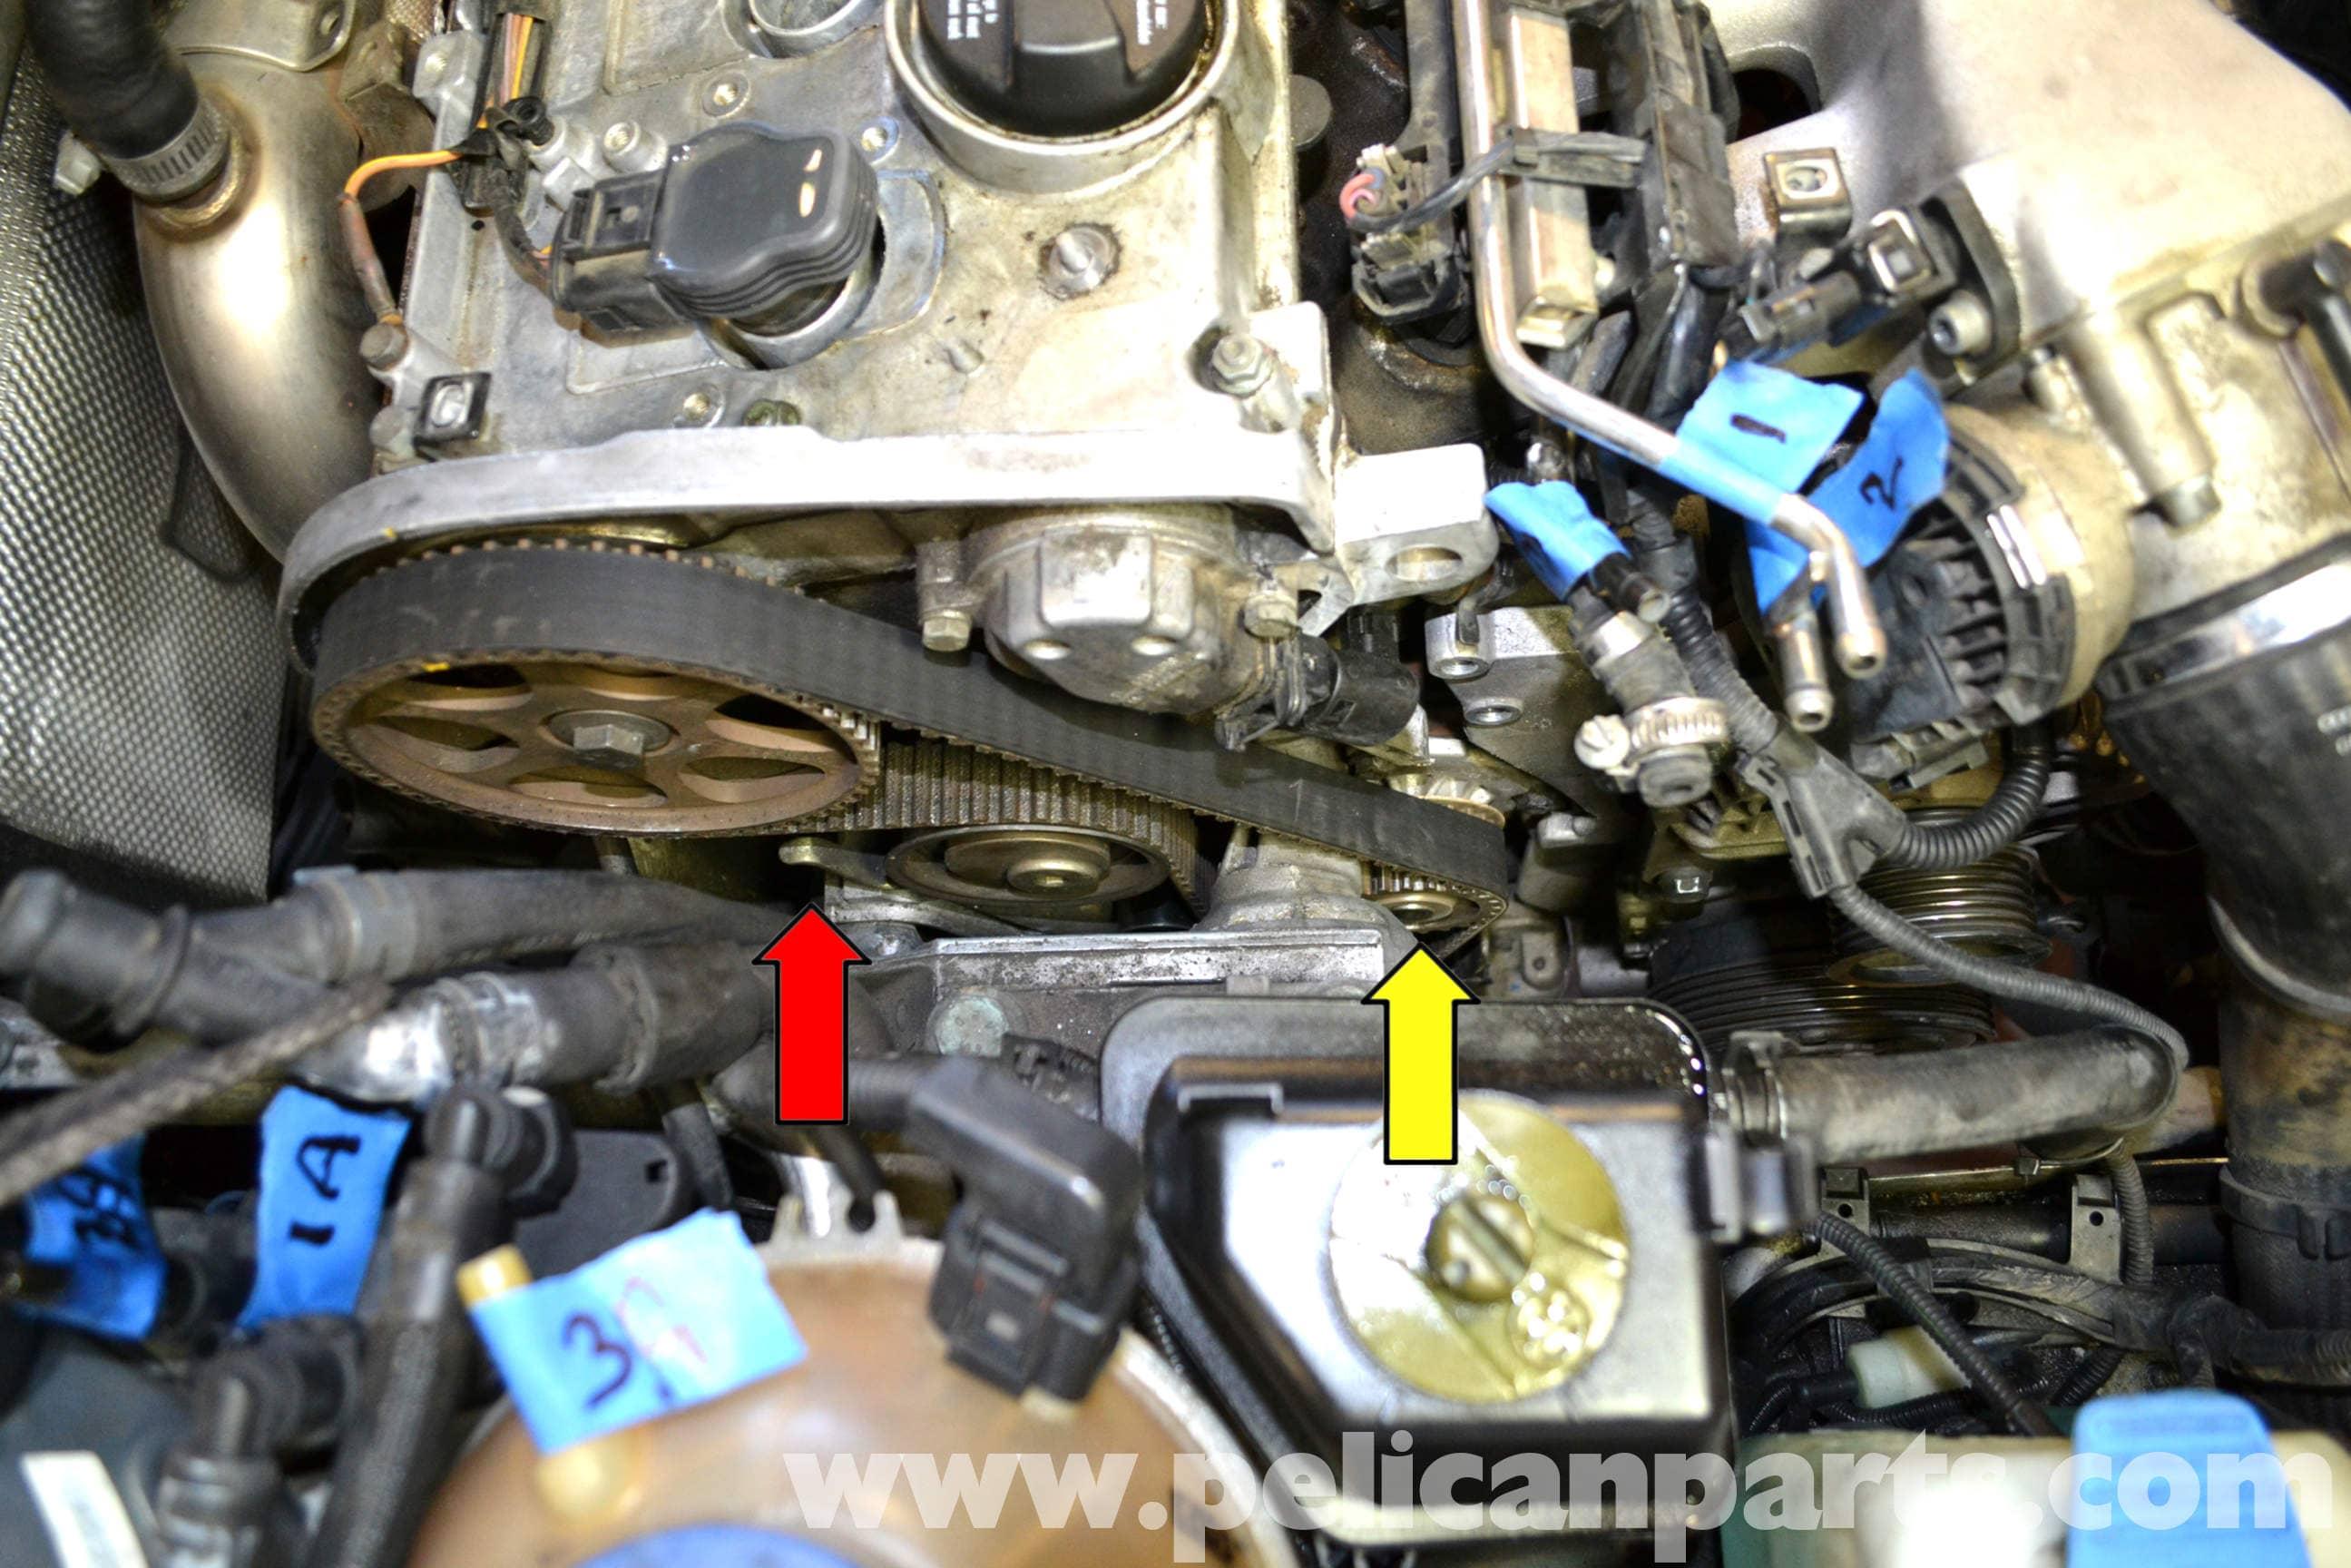 02 cabrio convertible top wiring diagram volkswagen golf gti mk iv water pump replacement  1999  volkswagen golf gti mk iv water pump replacement  1999